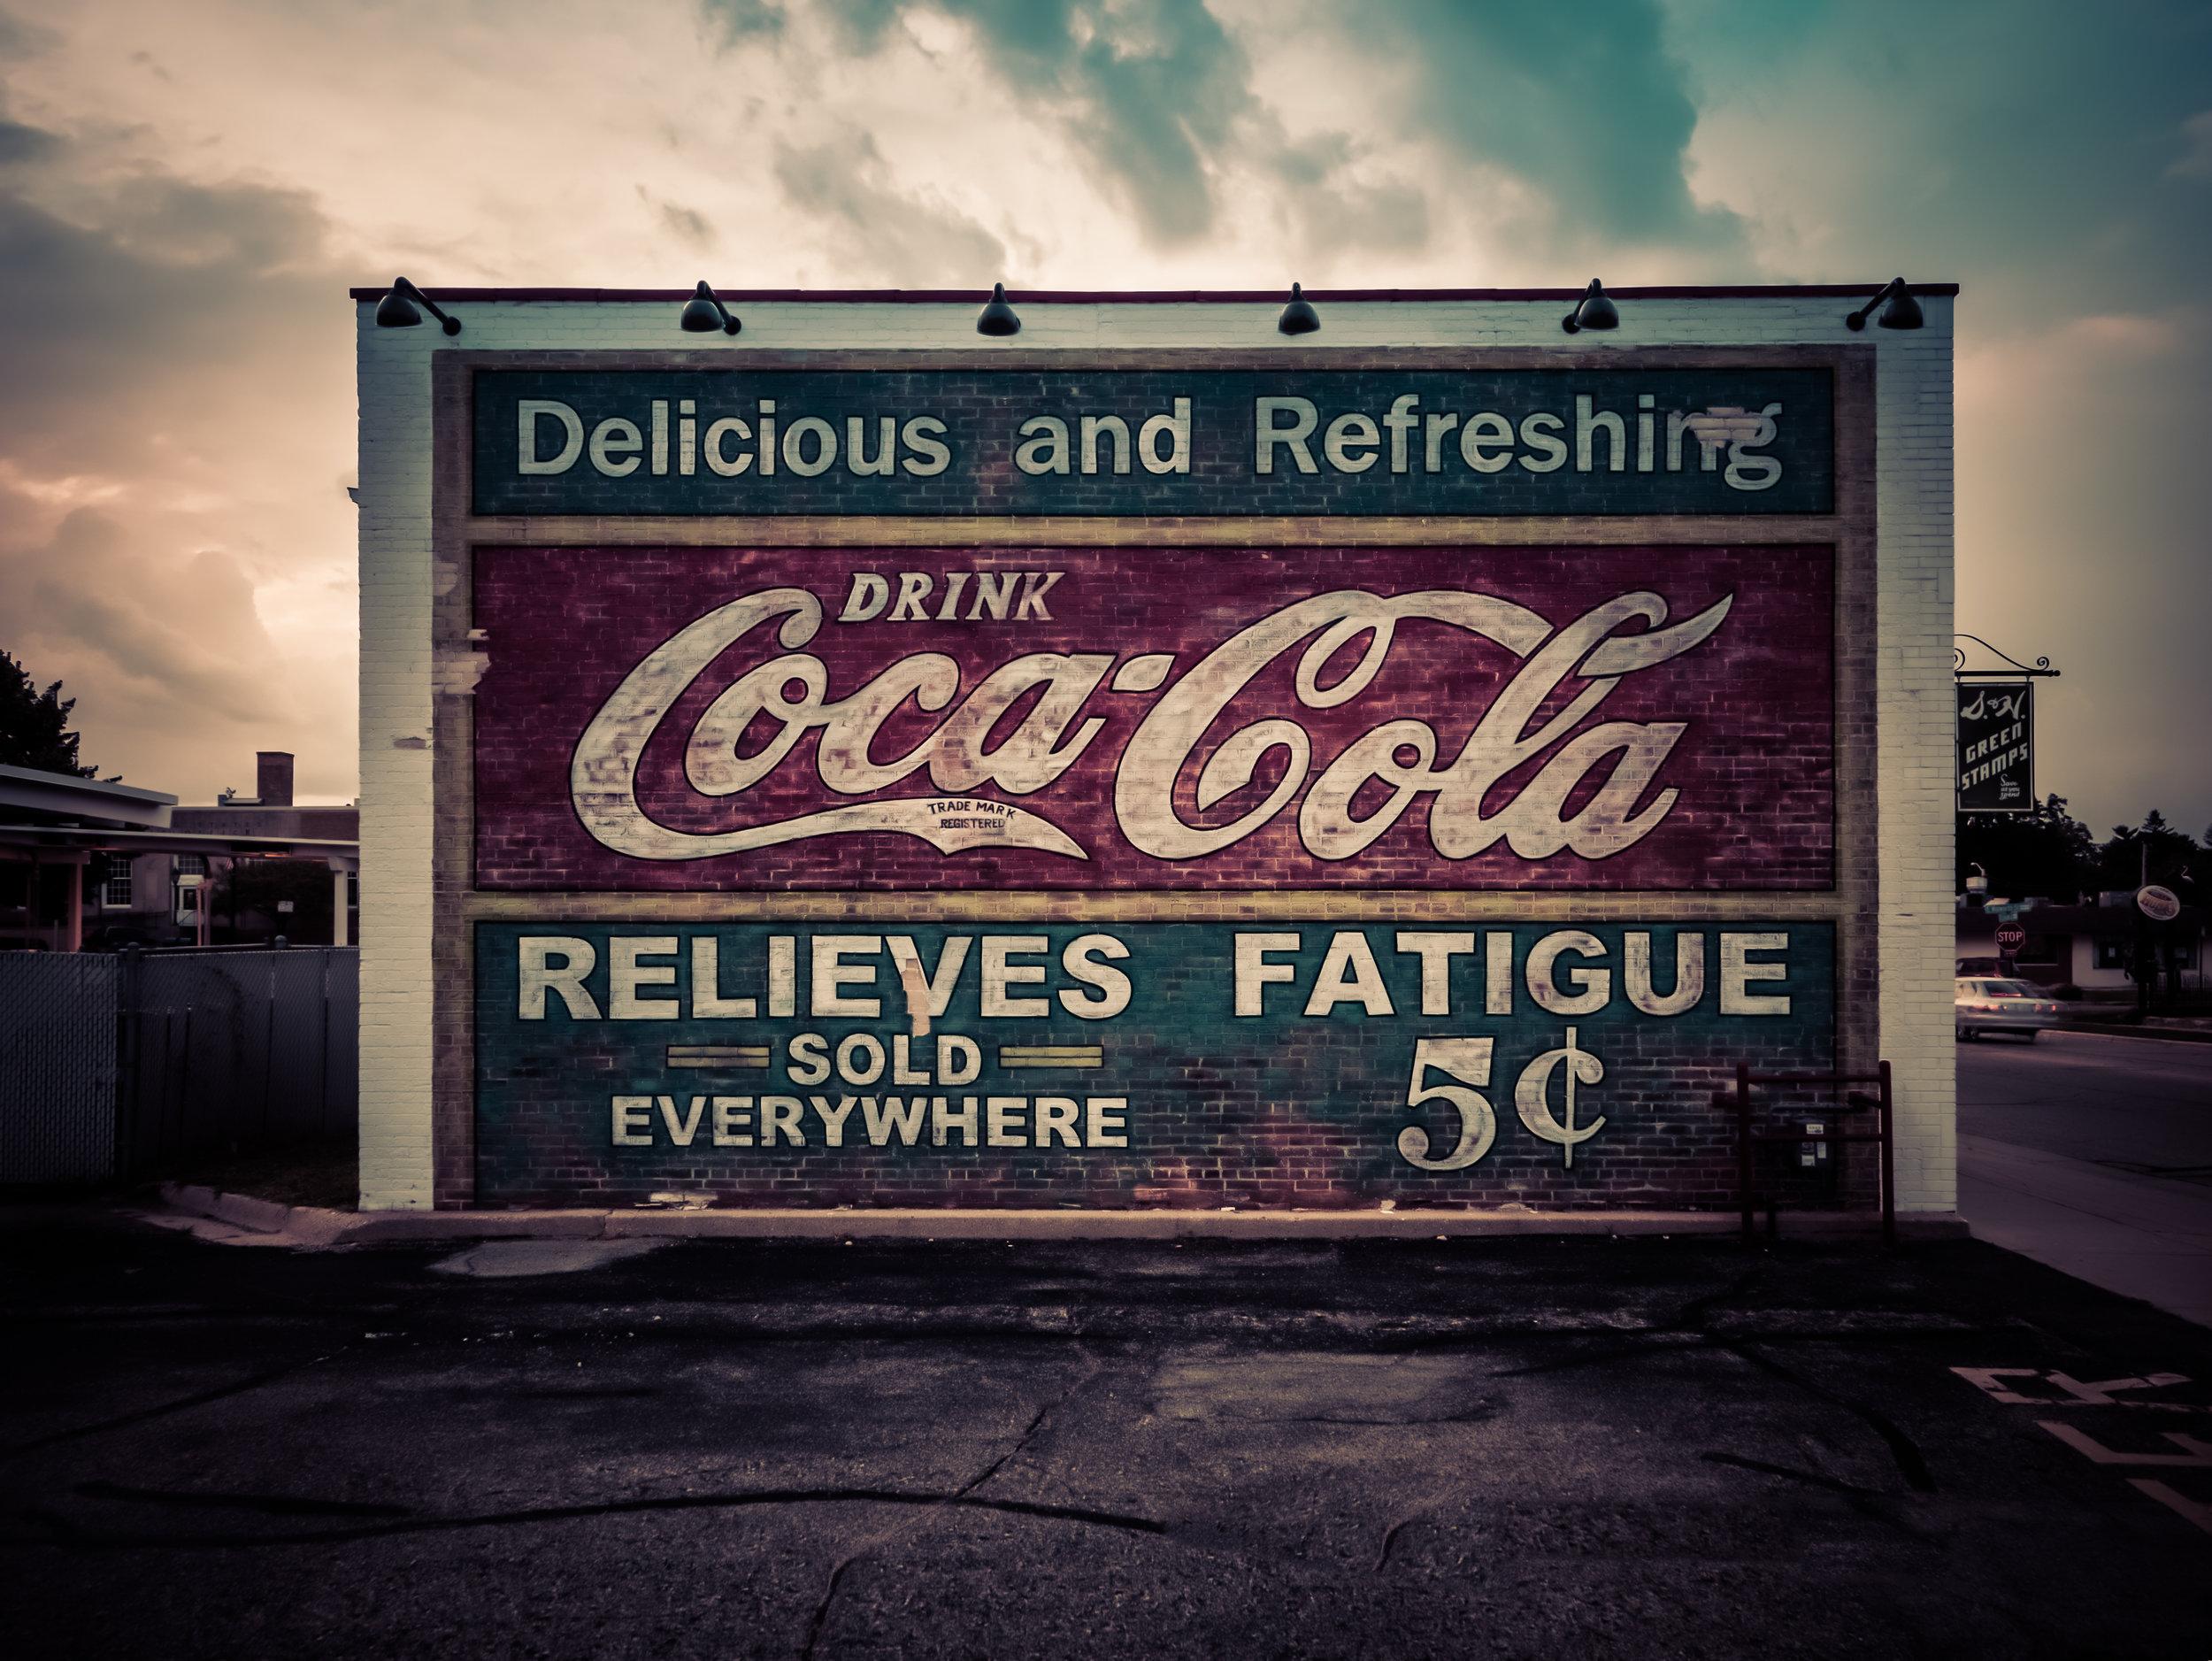 5 Cent Coke-4592 x 3448.jpg